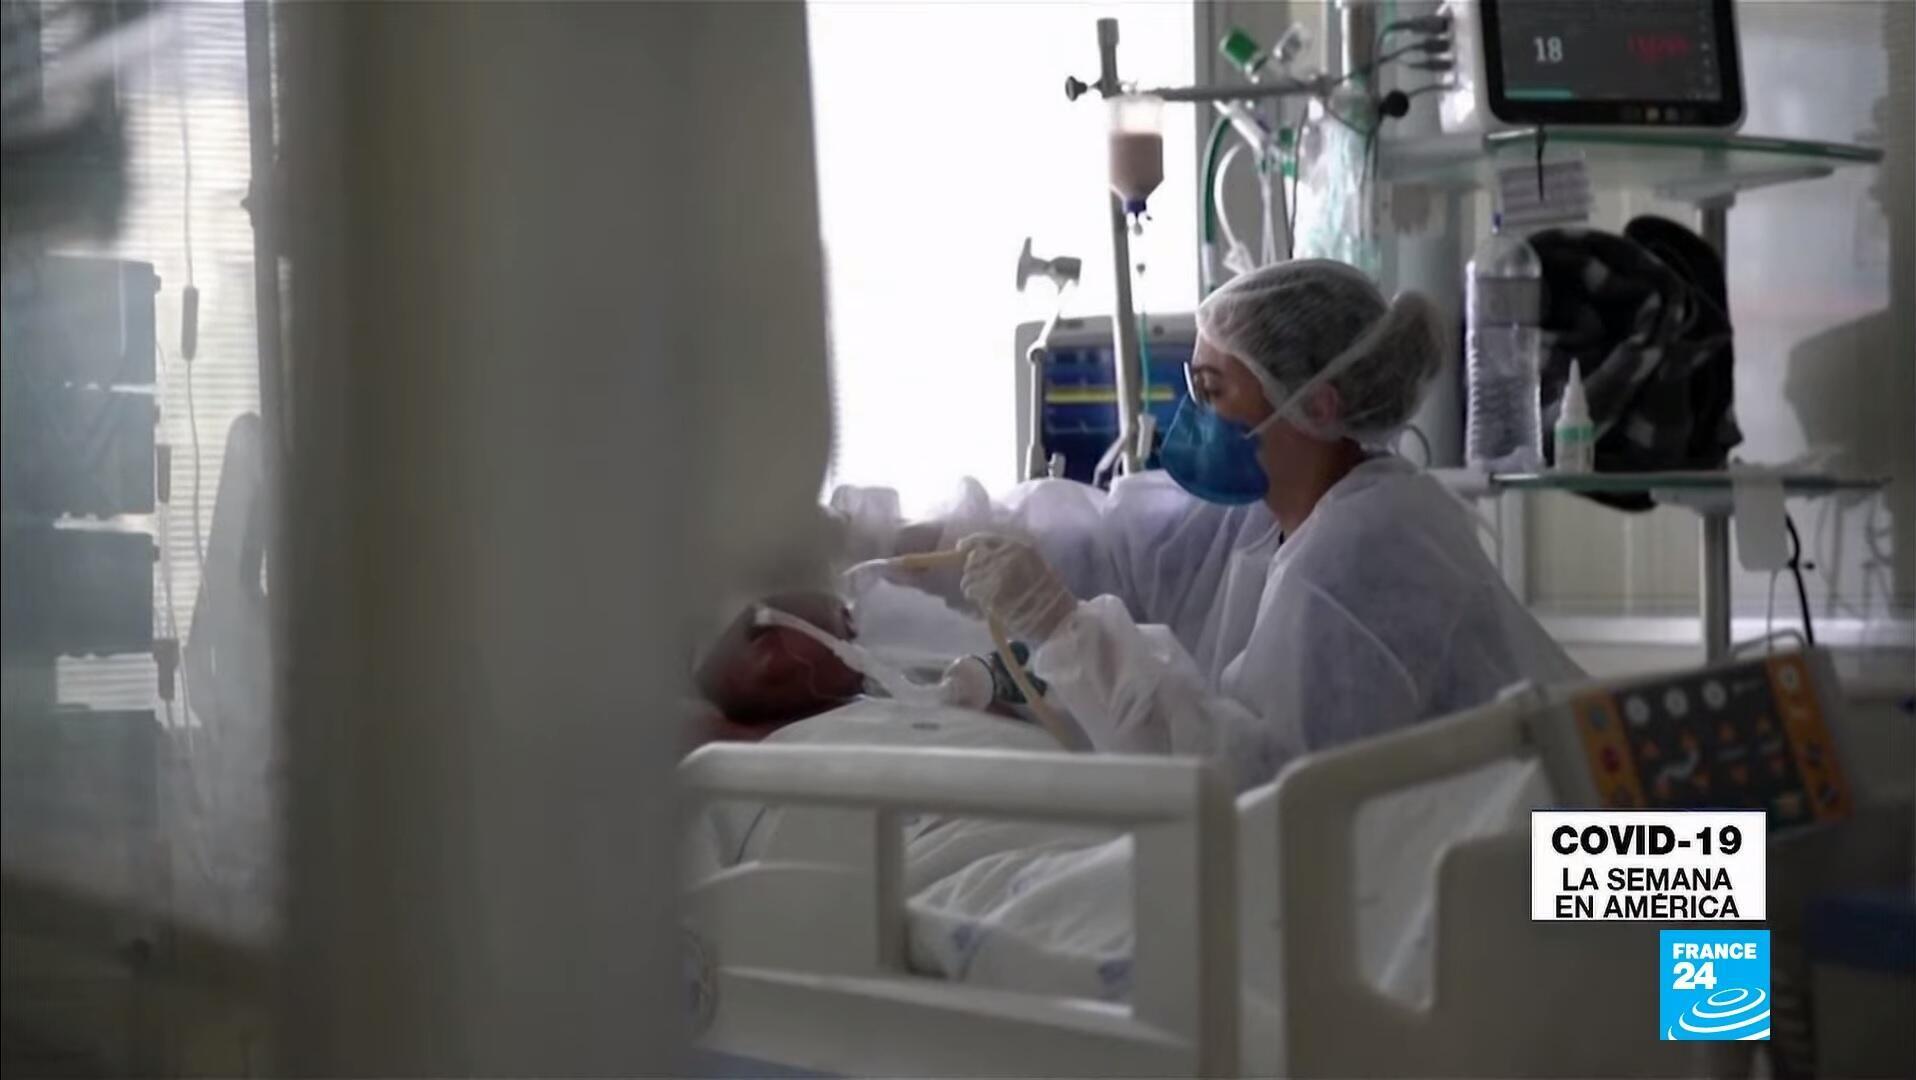 semana en América - 3 millones de muertes covid-19